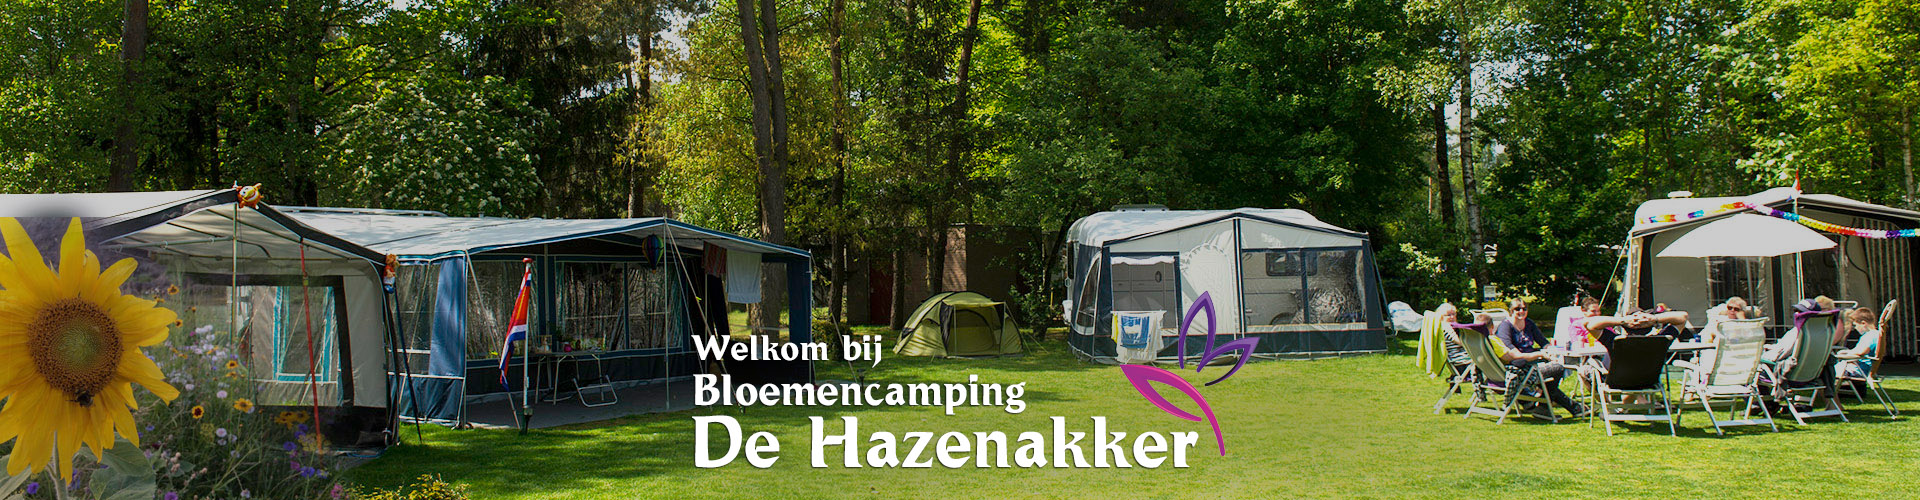 Bloemencamping De Hazenakker